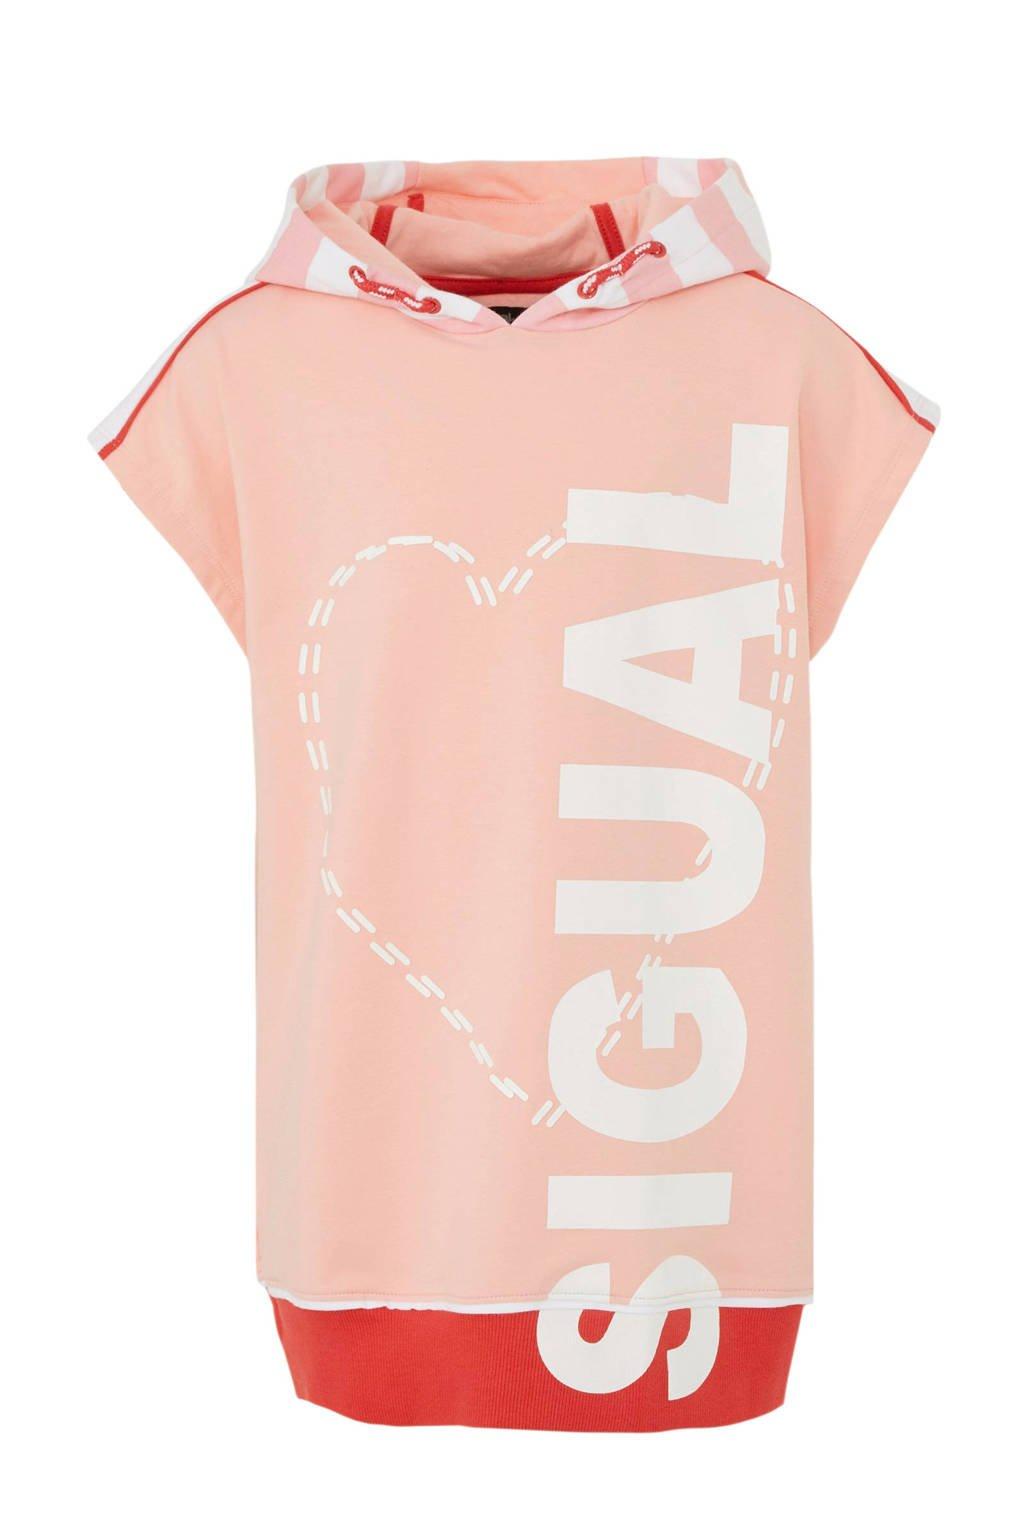 Desigual hoodie met printopdruk roze/wit, Roze/wit